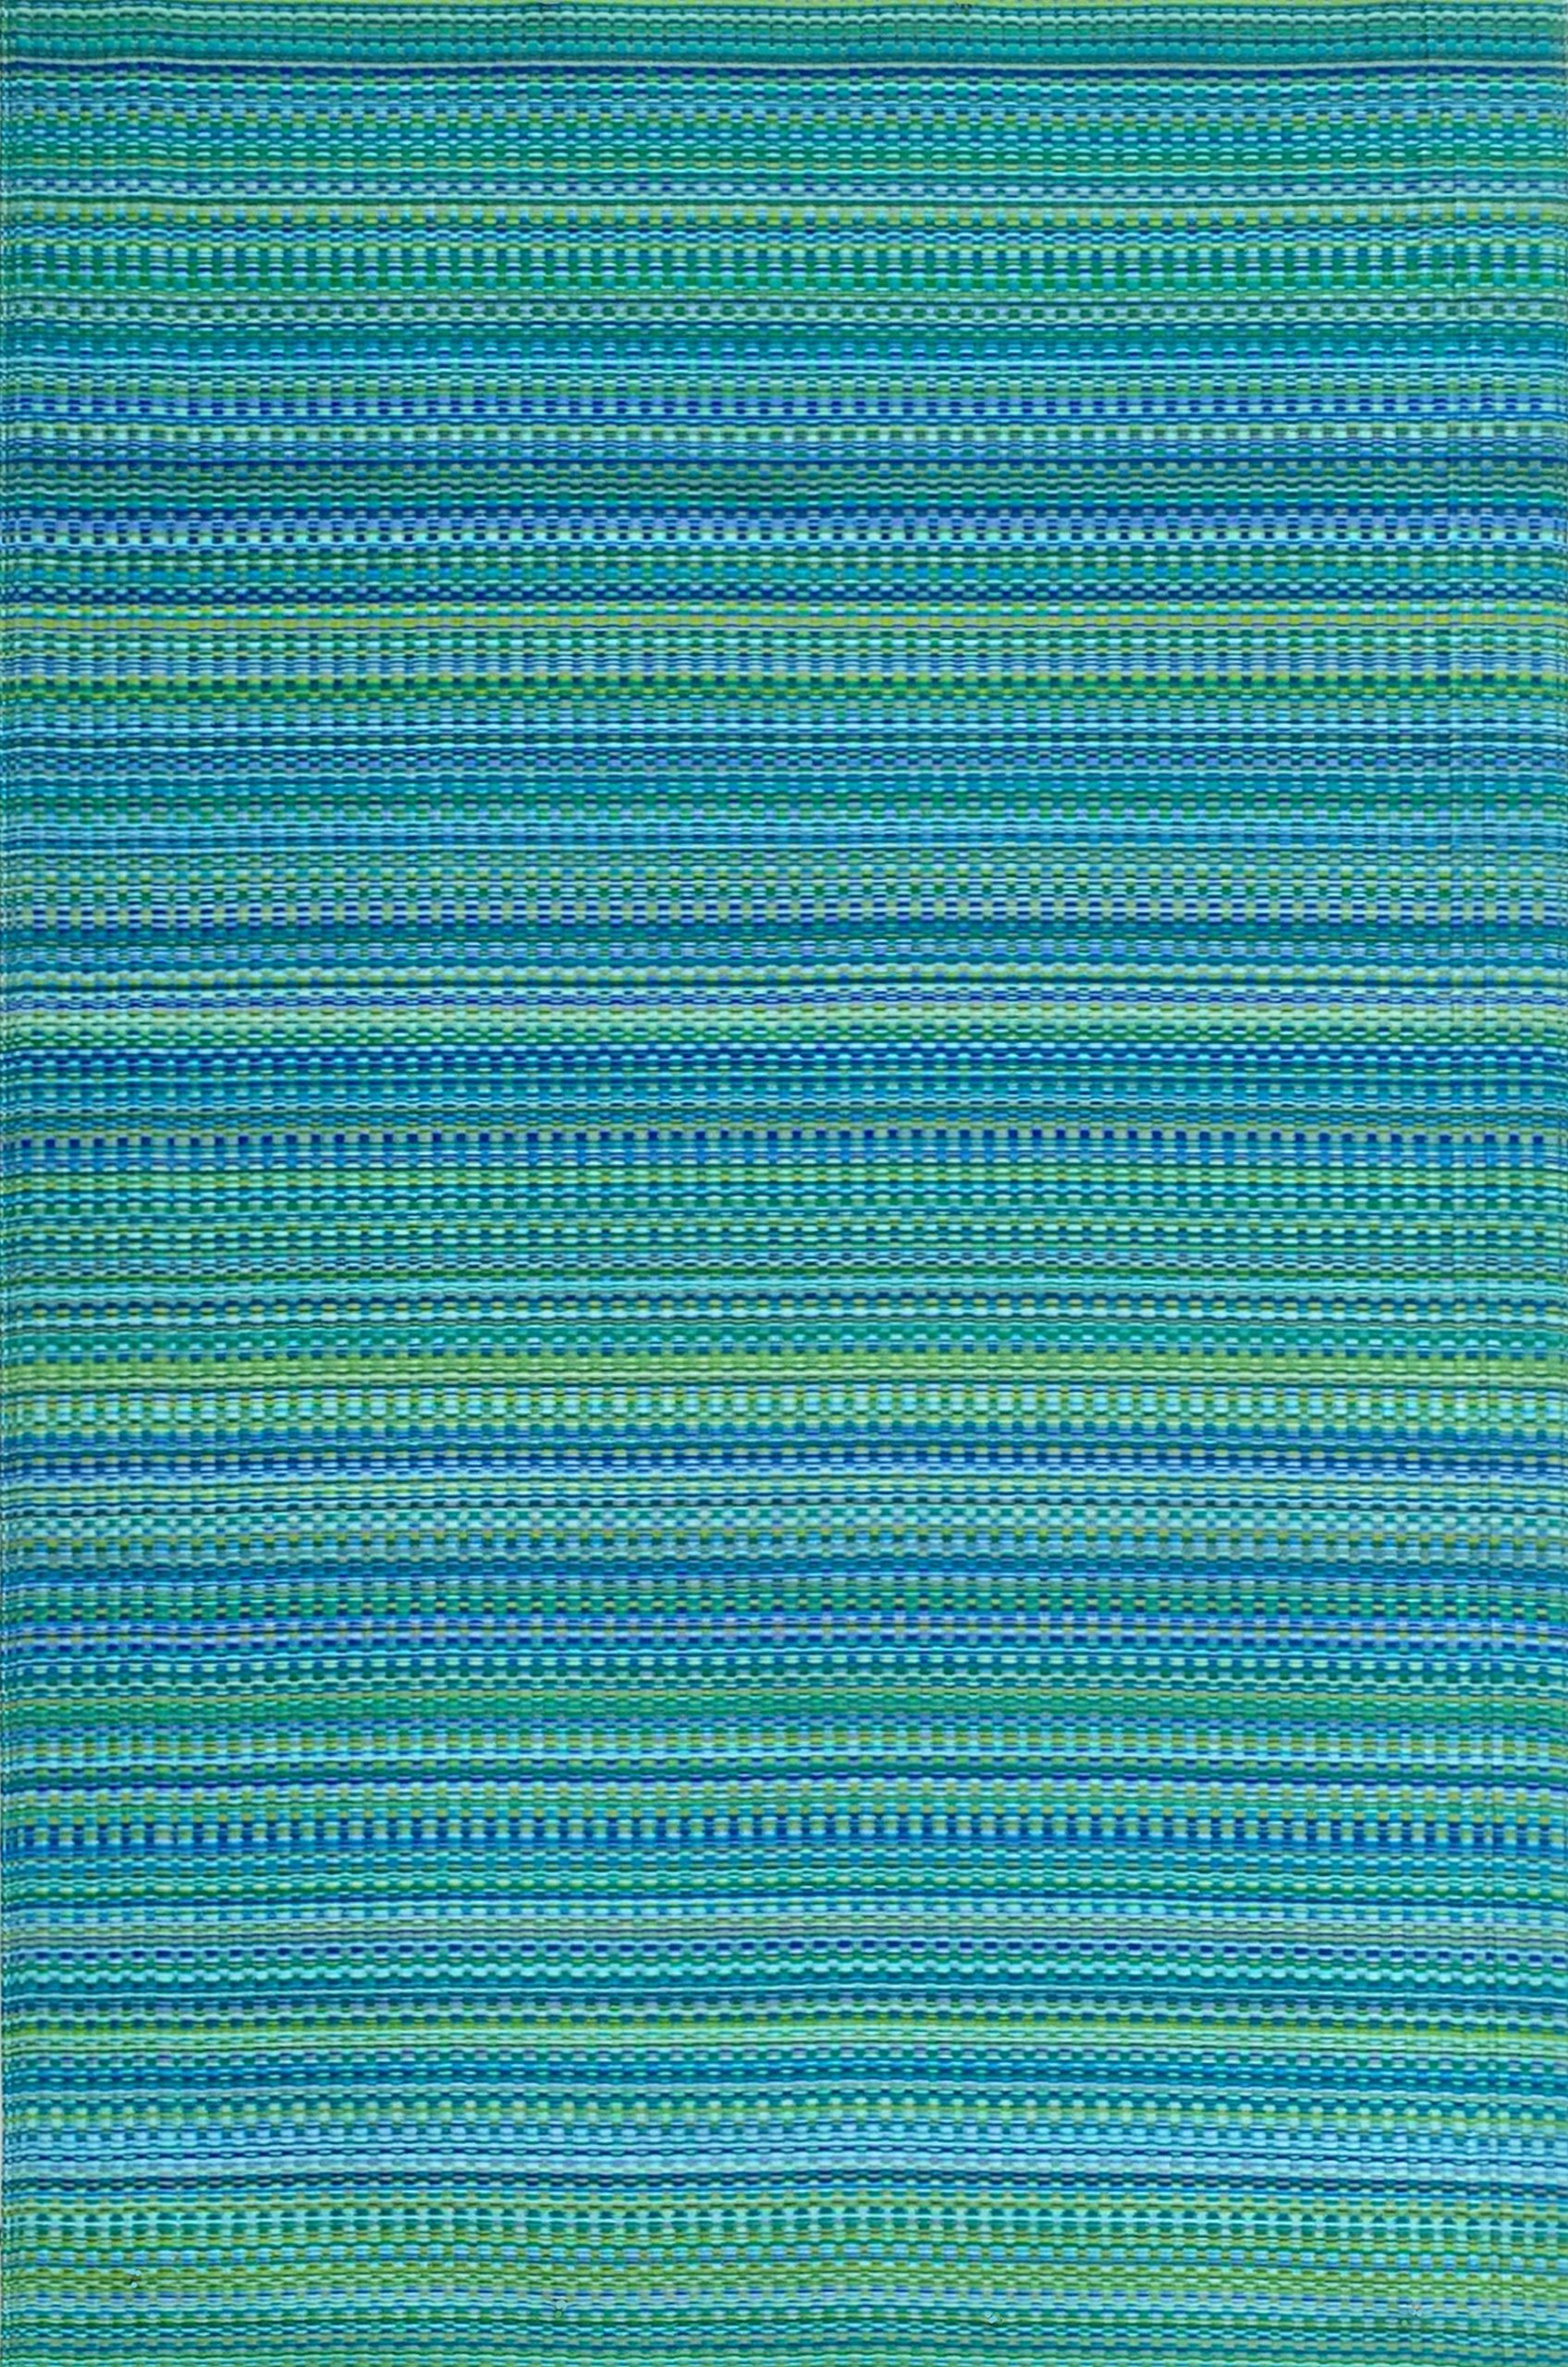 Mad Mats® Mixed Indoor/Outdoor Floor Mat, 4 x 6 Feet, Tropical